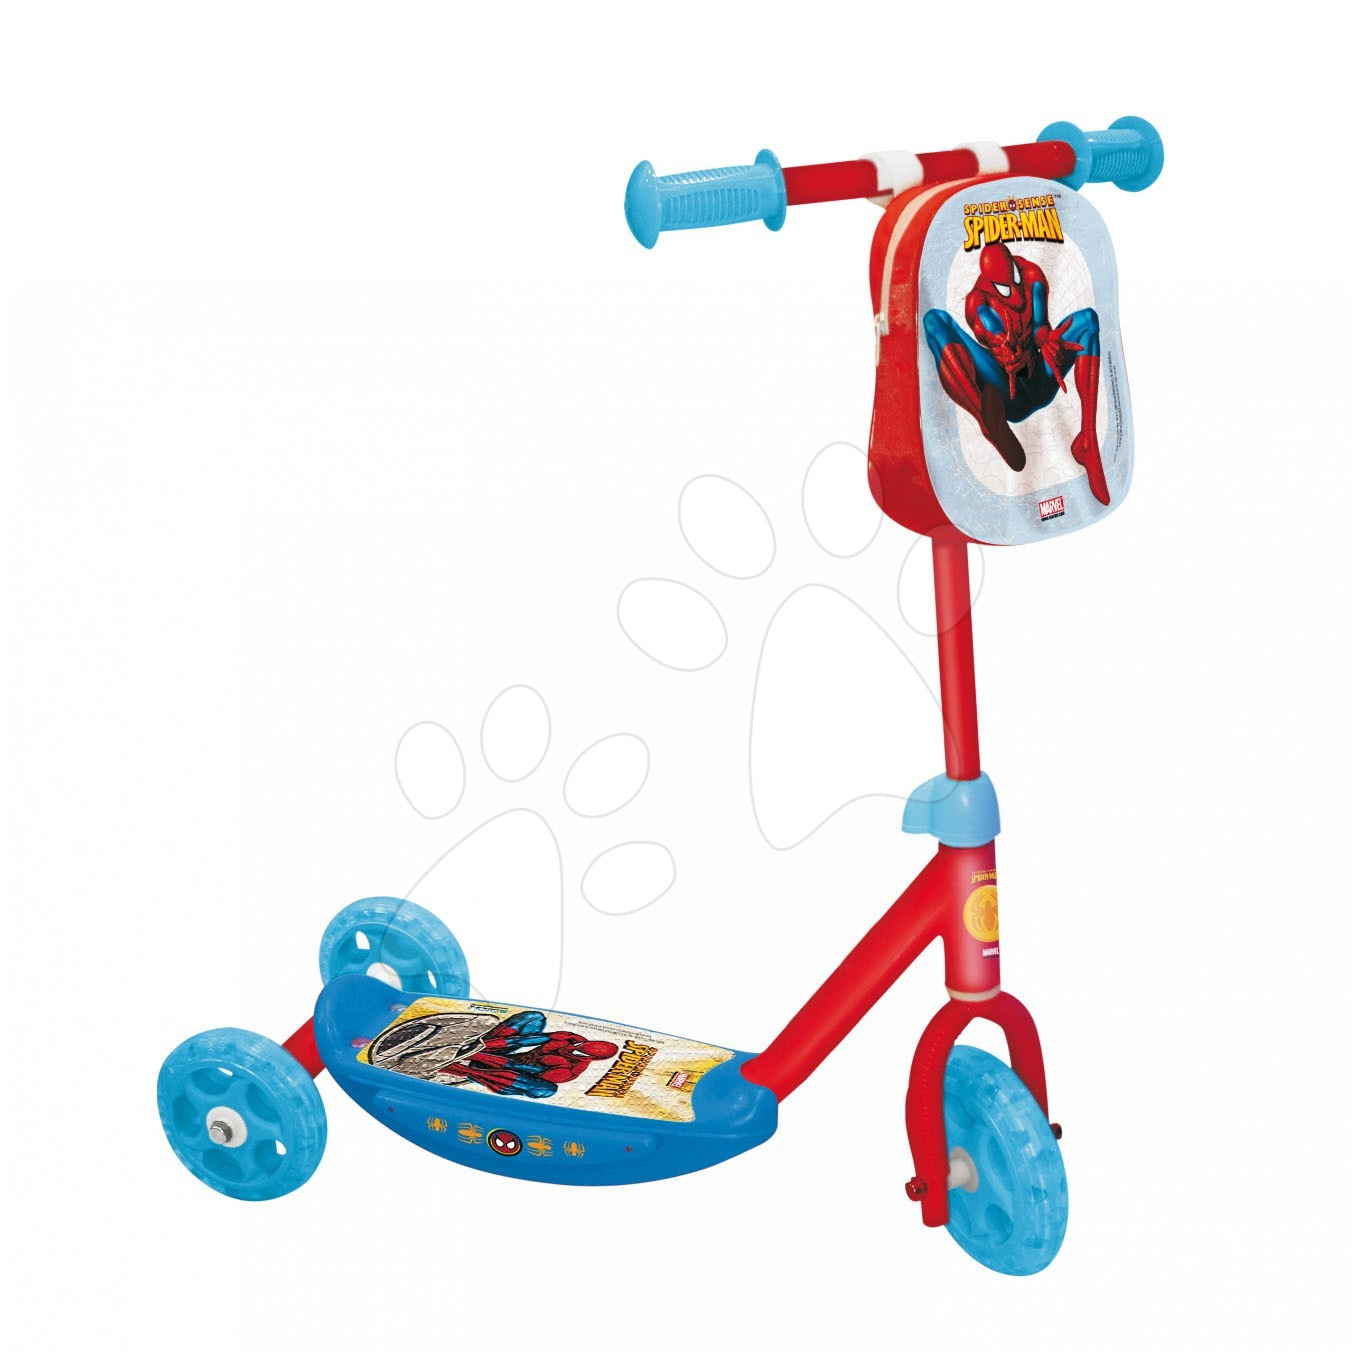 Trojkolesová kolobežka Spiderman Mondo s taškou